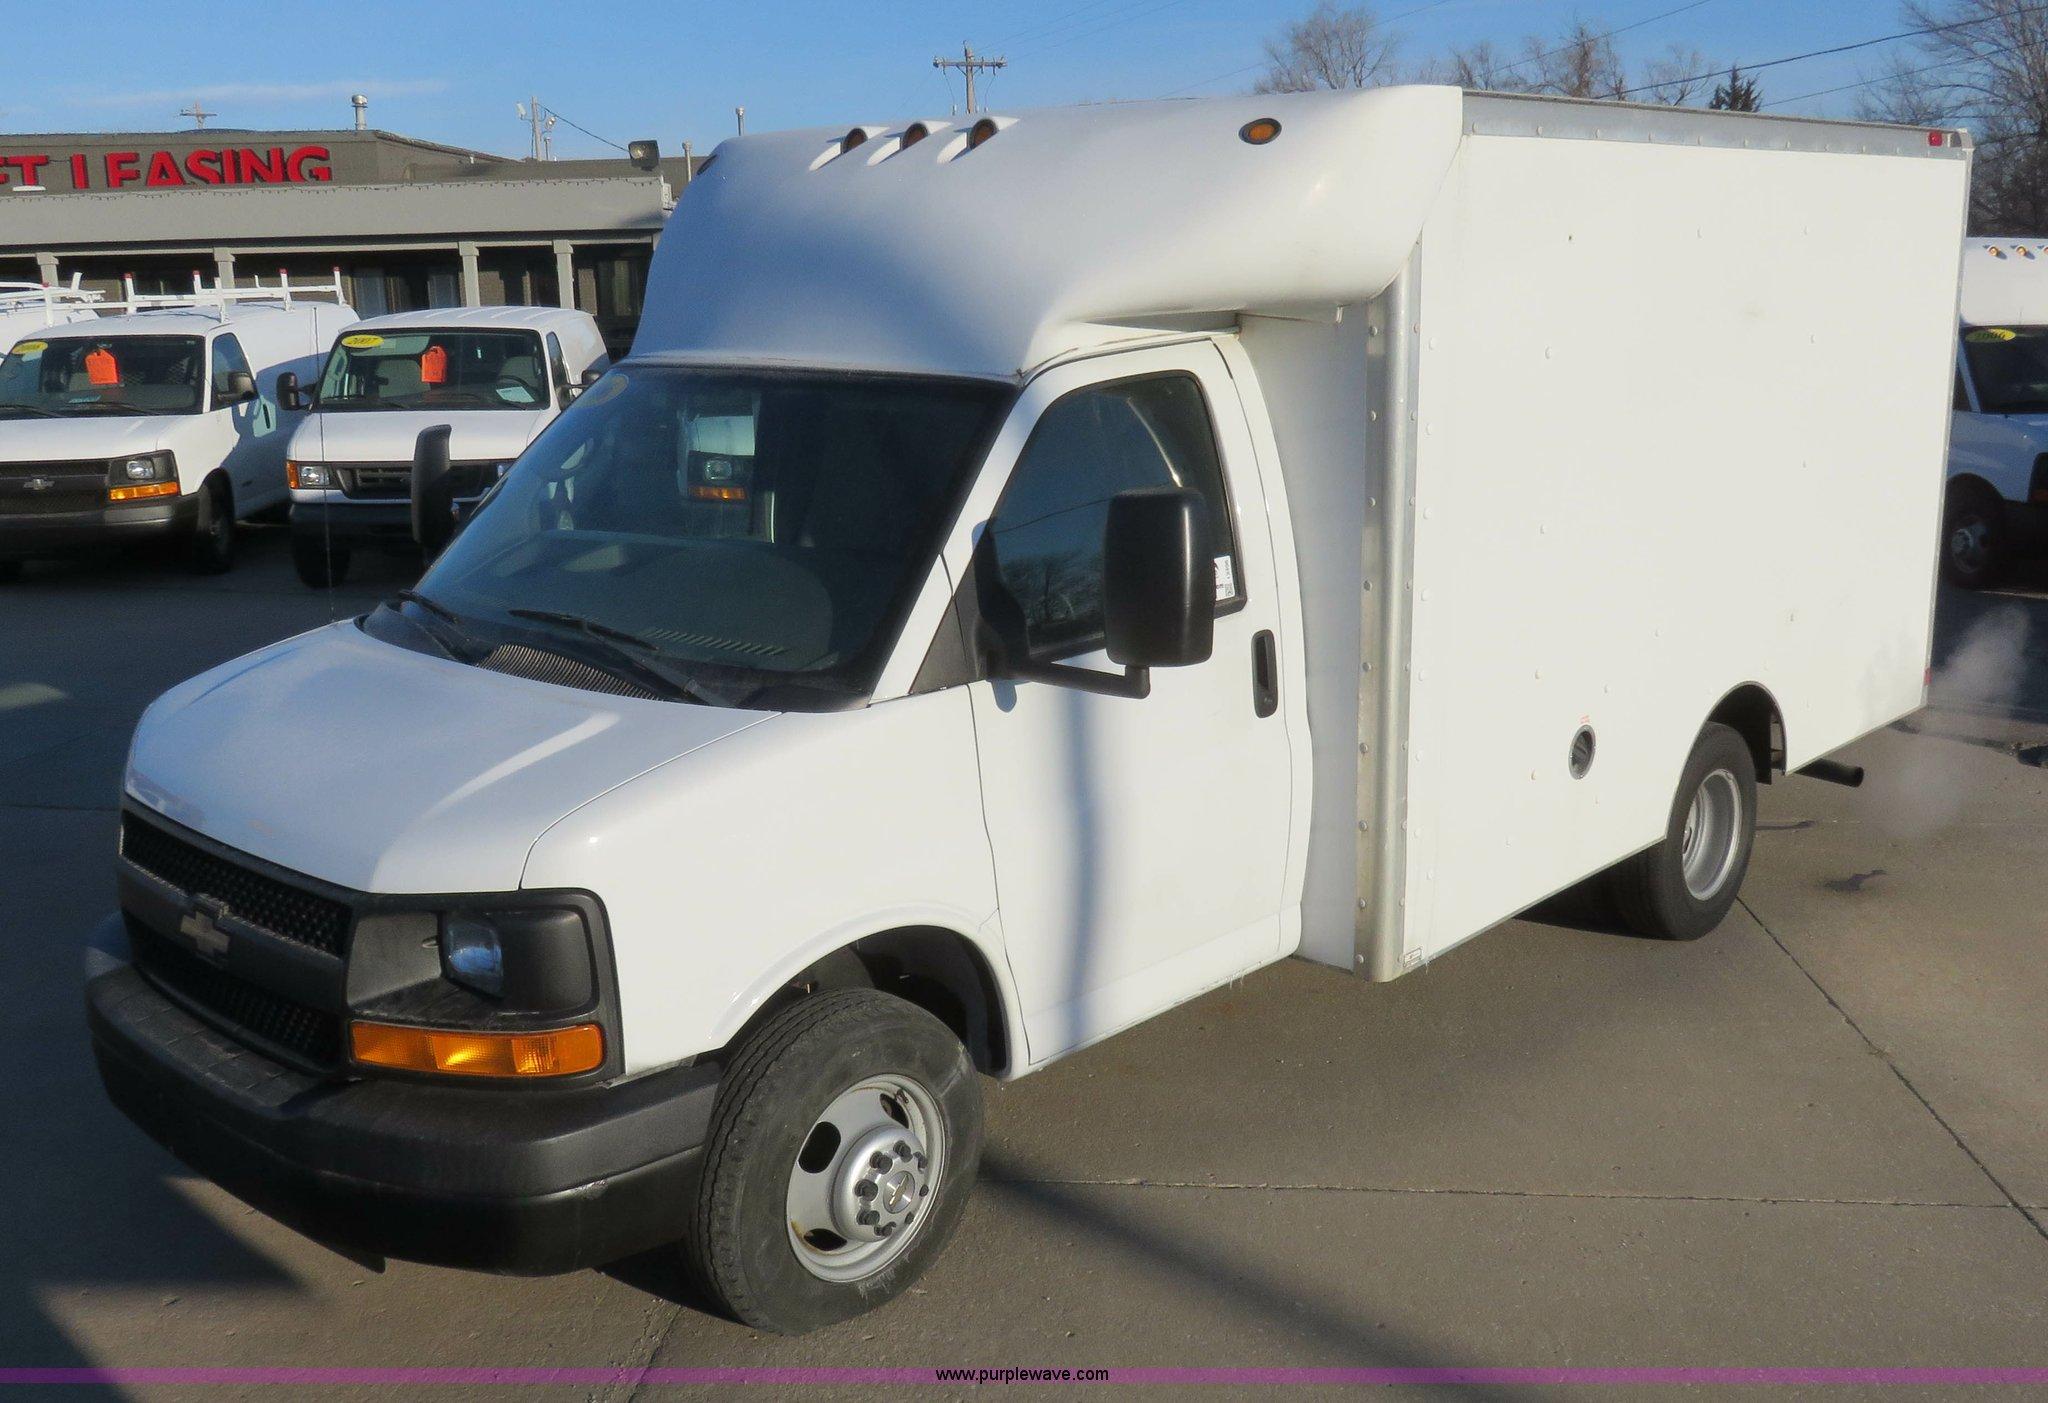 2006 chevrolet express g3500 box truck item i2406 sold rh purplewave com 2020 Chevy Truck 2020 Chevy Truck